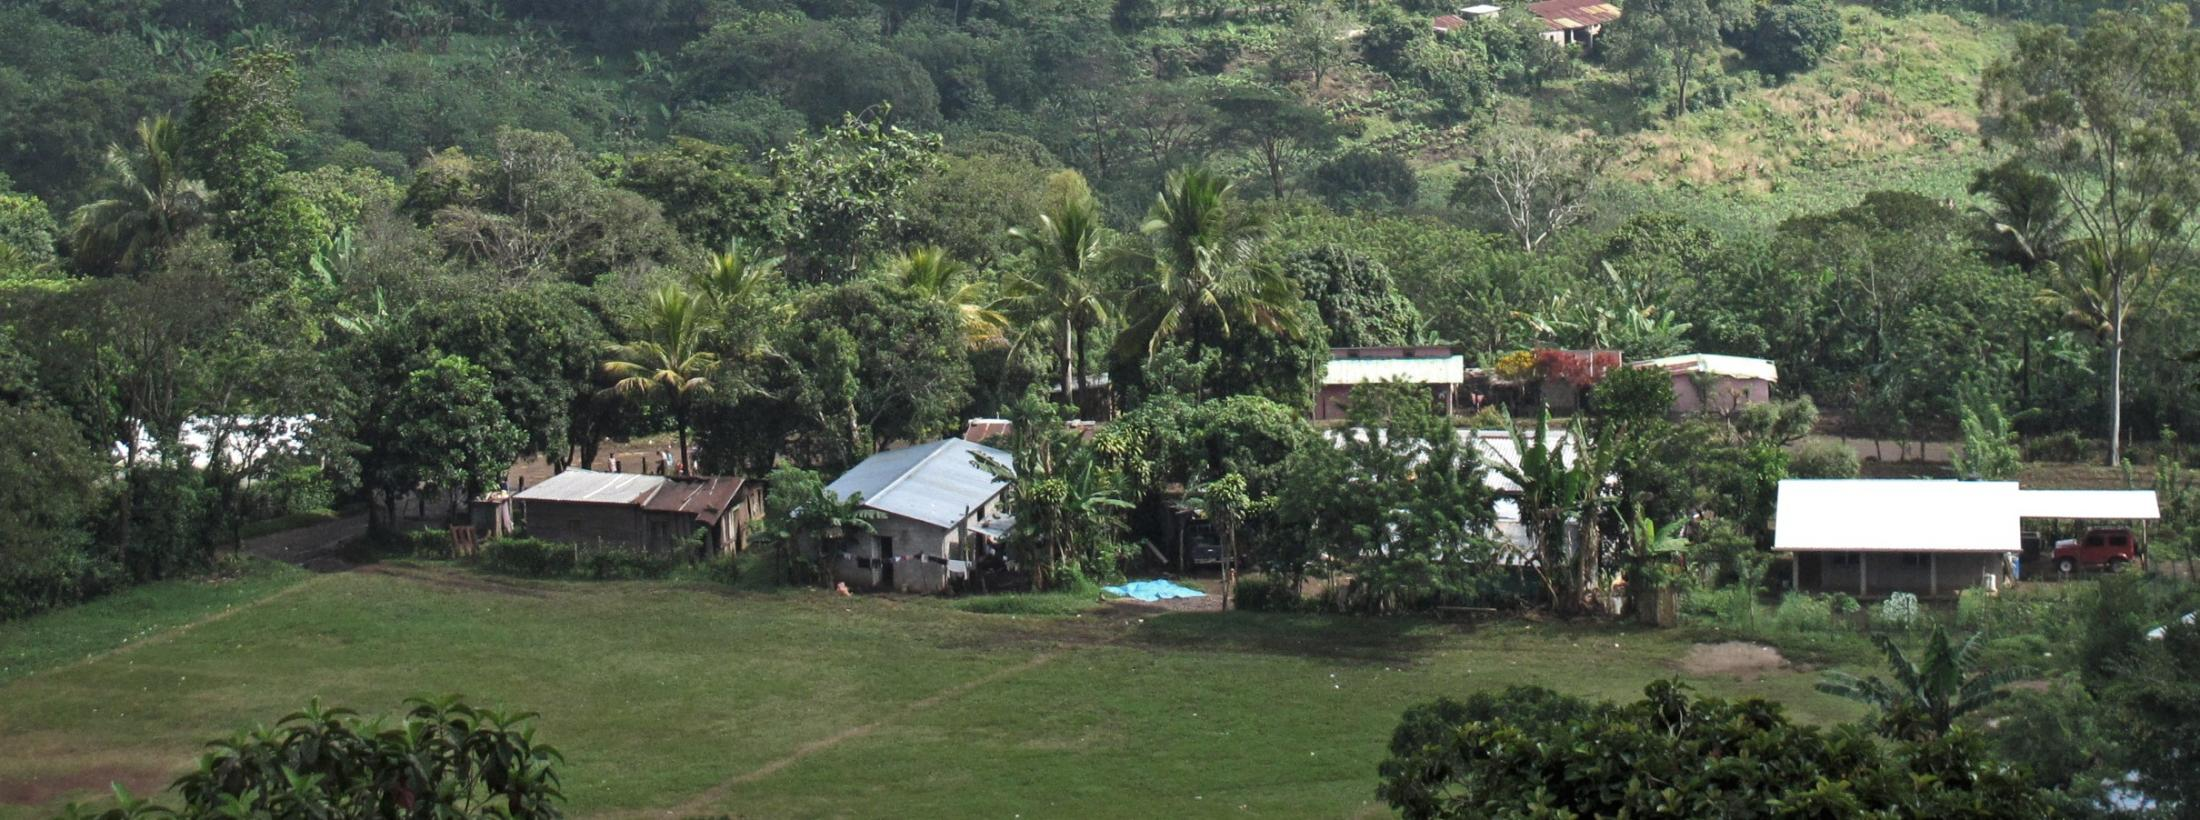 Aerial view of Las Lomitas, Honduras